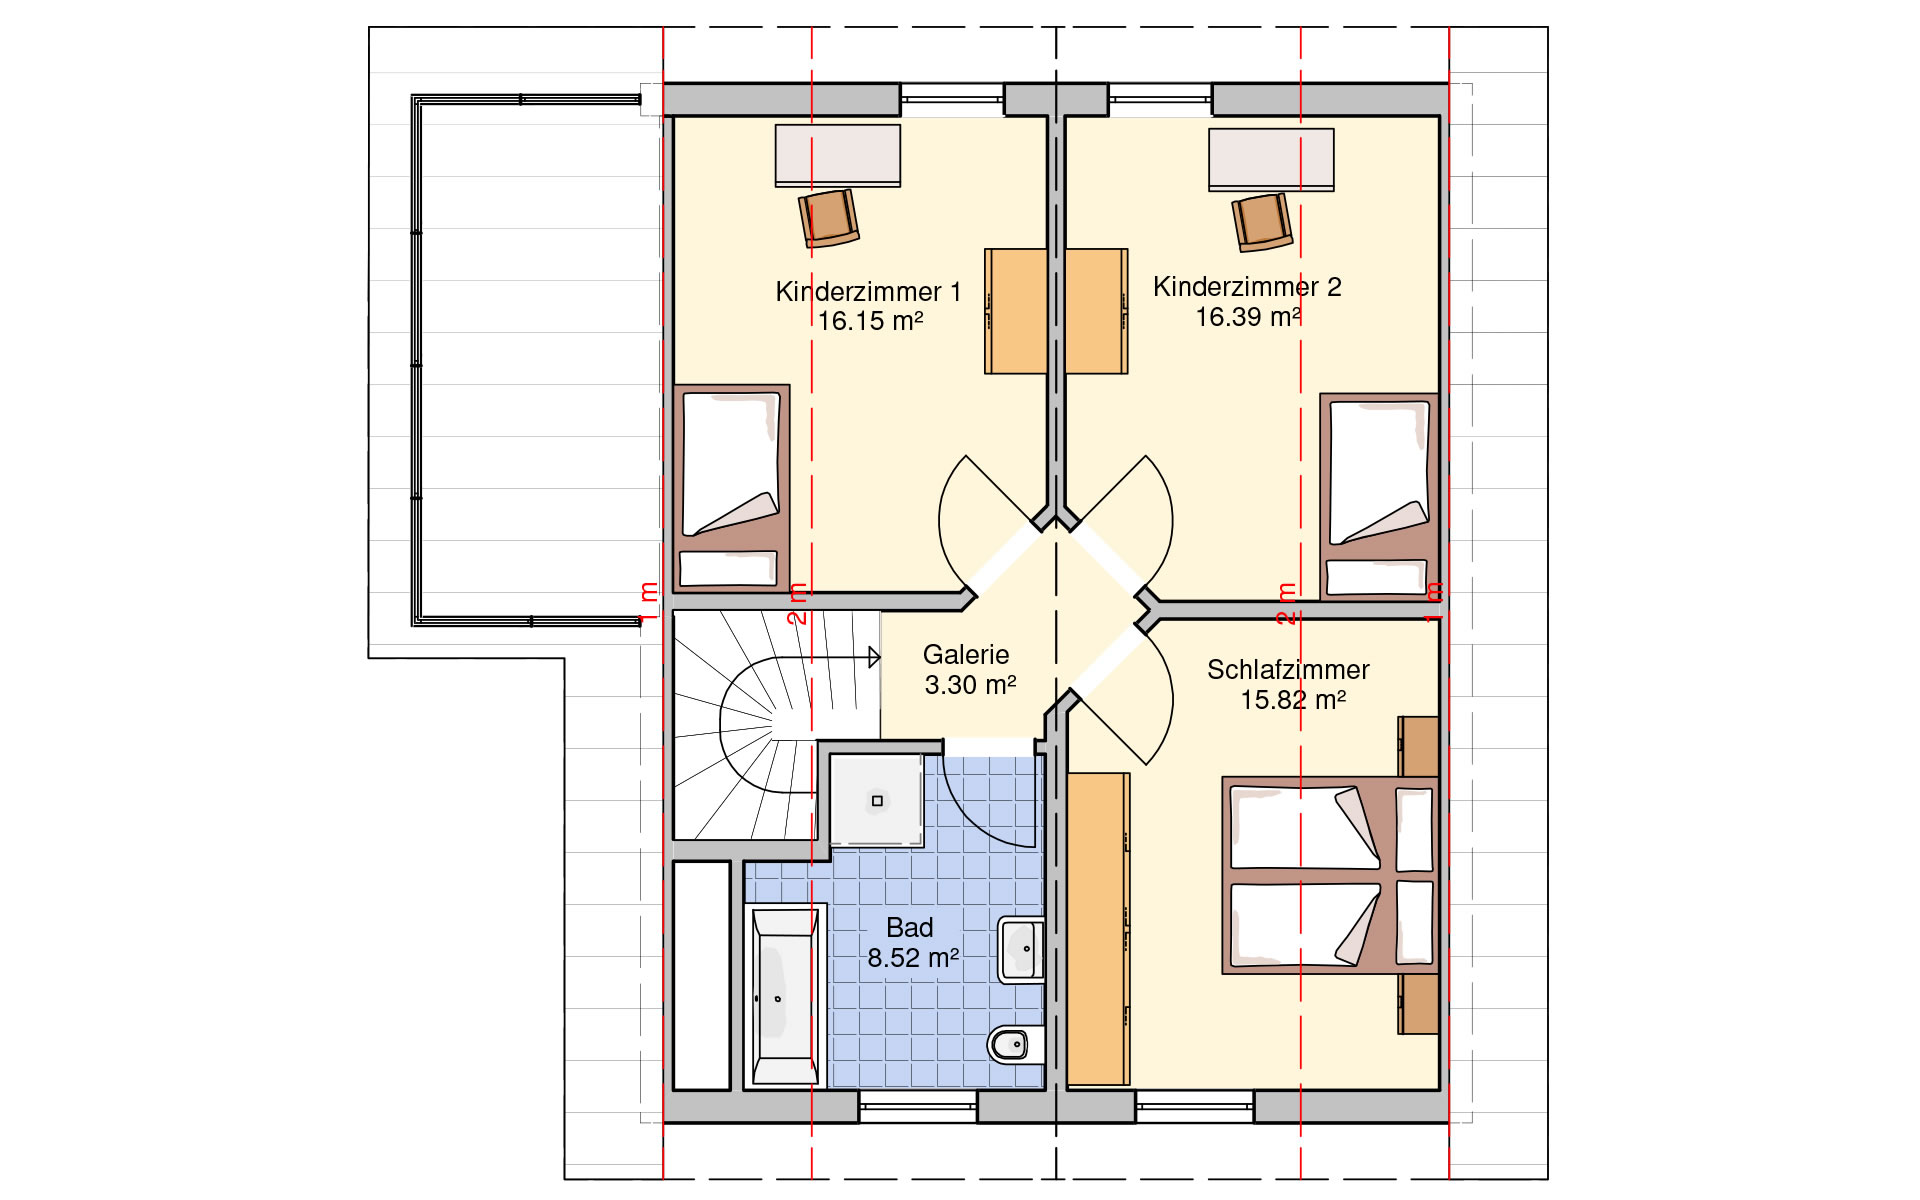 Dachgeschoss Stockholm von Fingerhut Haus GmbH & Co. KG